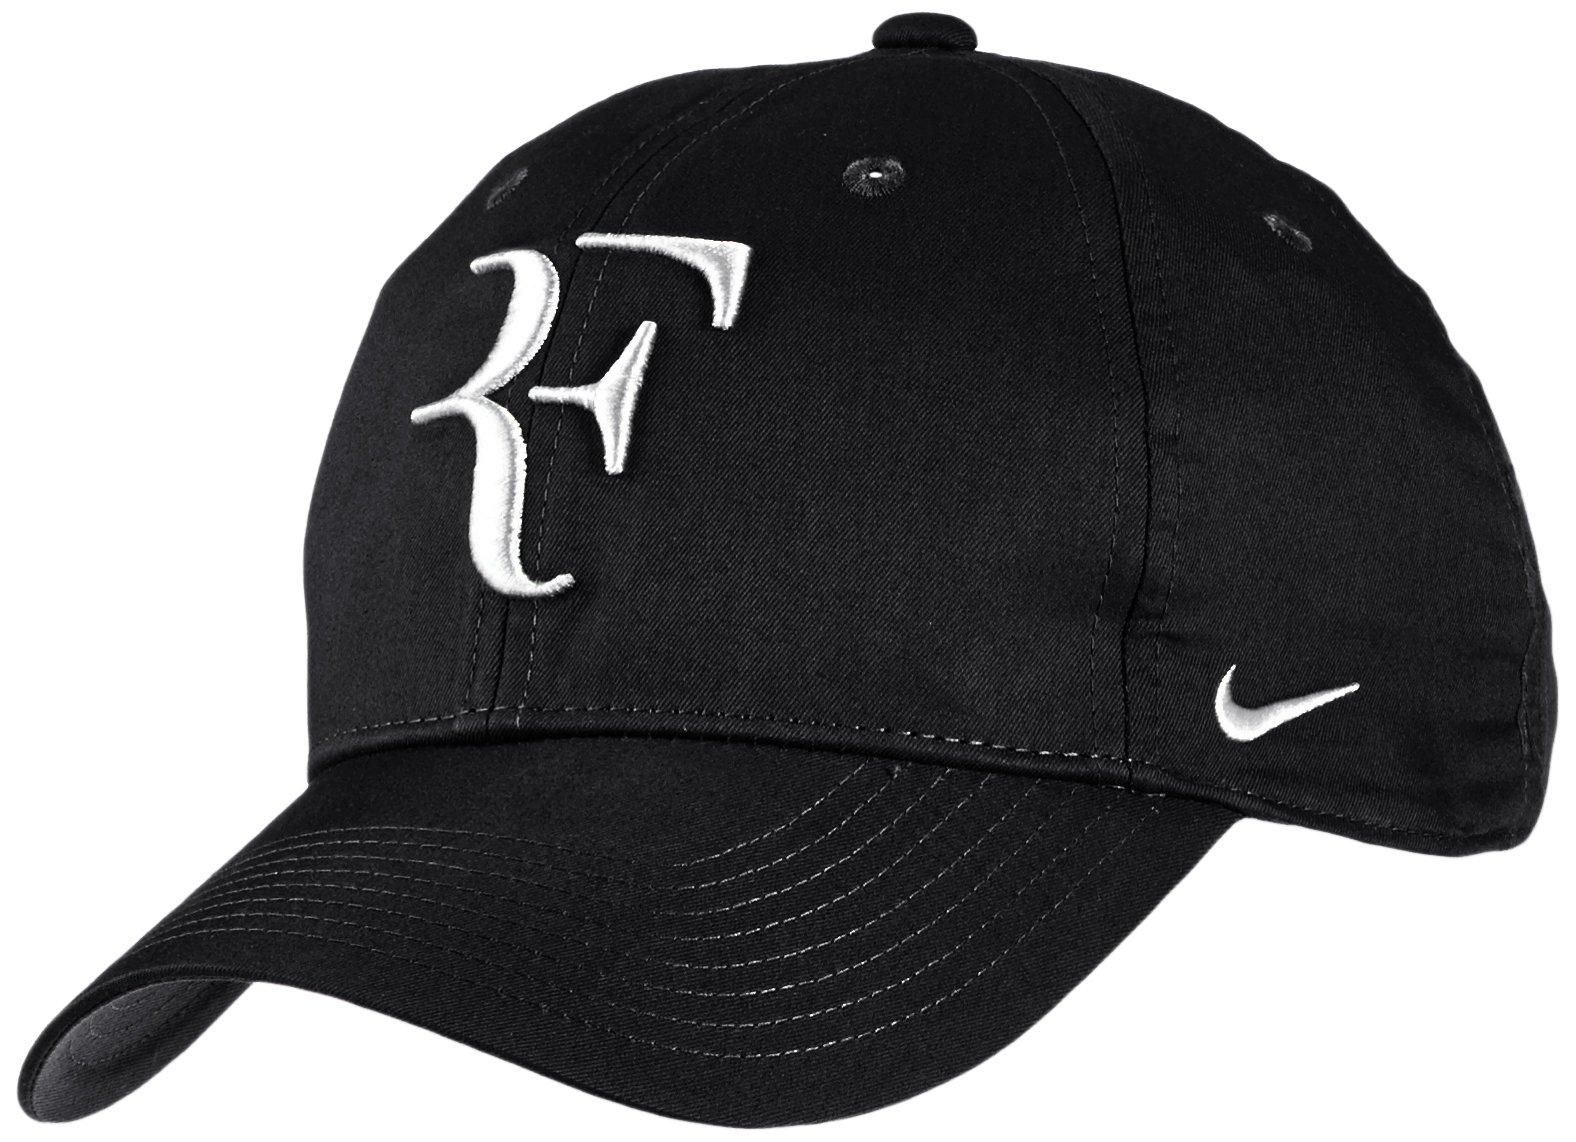 Mens Nike Premier RF Hybrid Adjustable Tennis Hat Black/White 371202-012